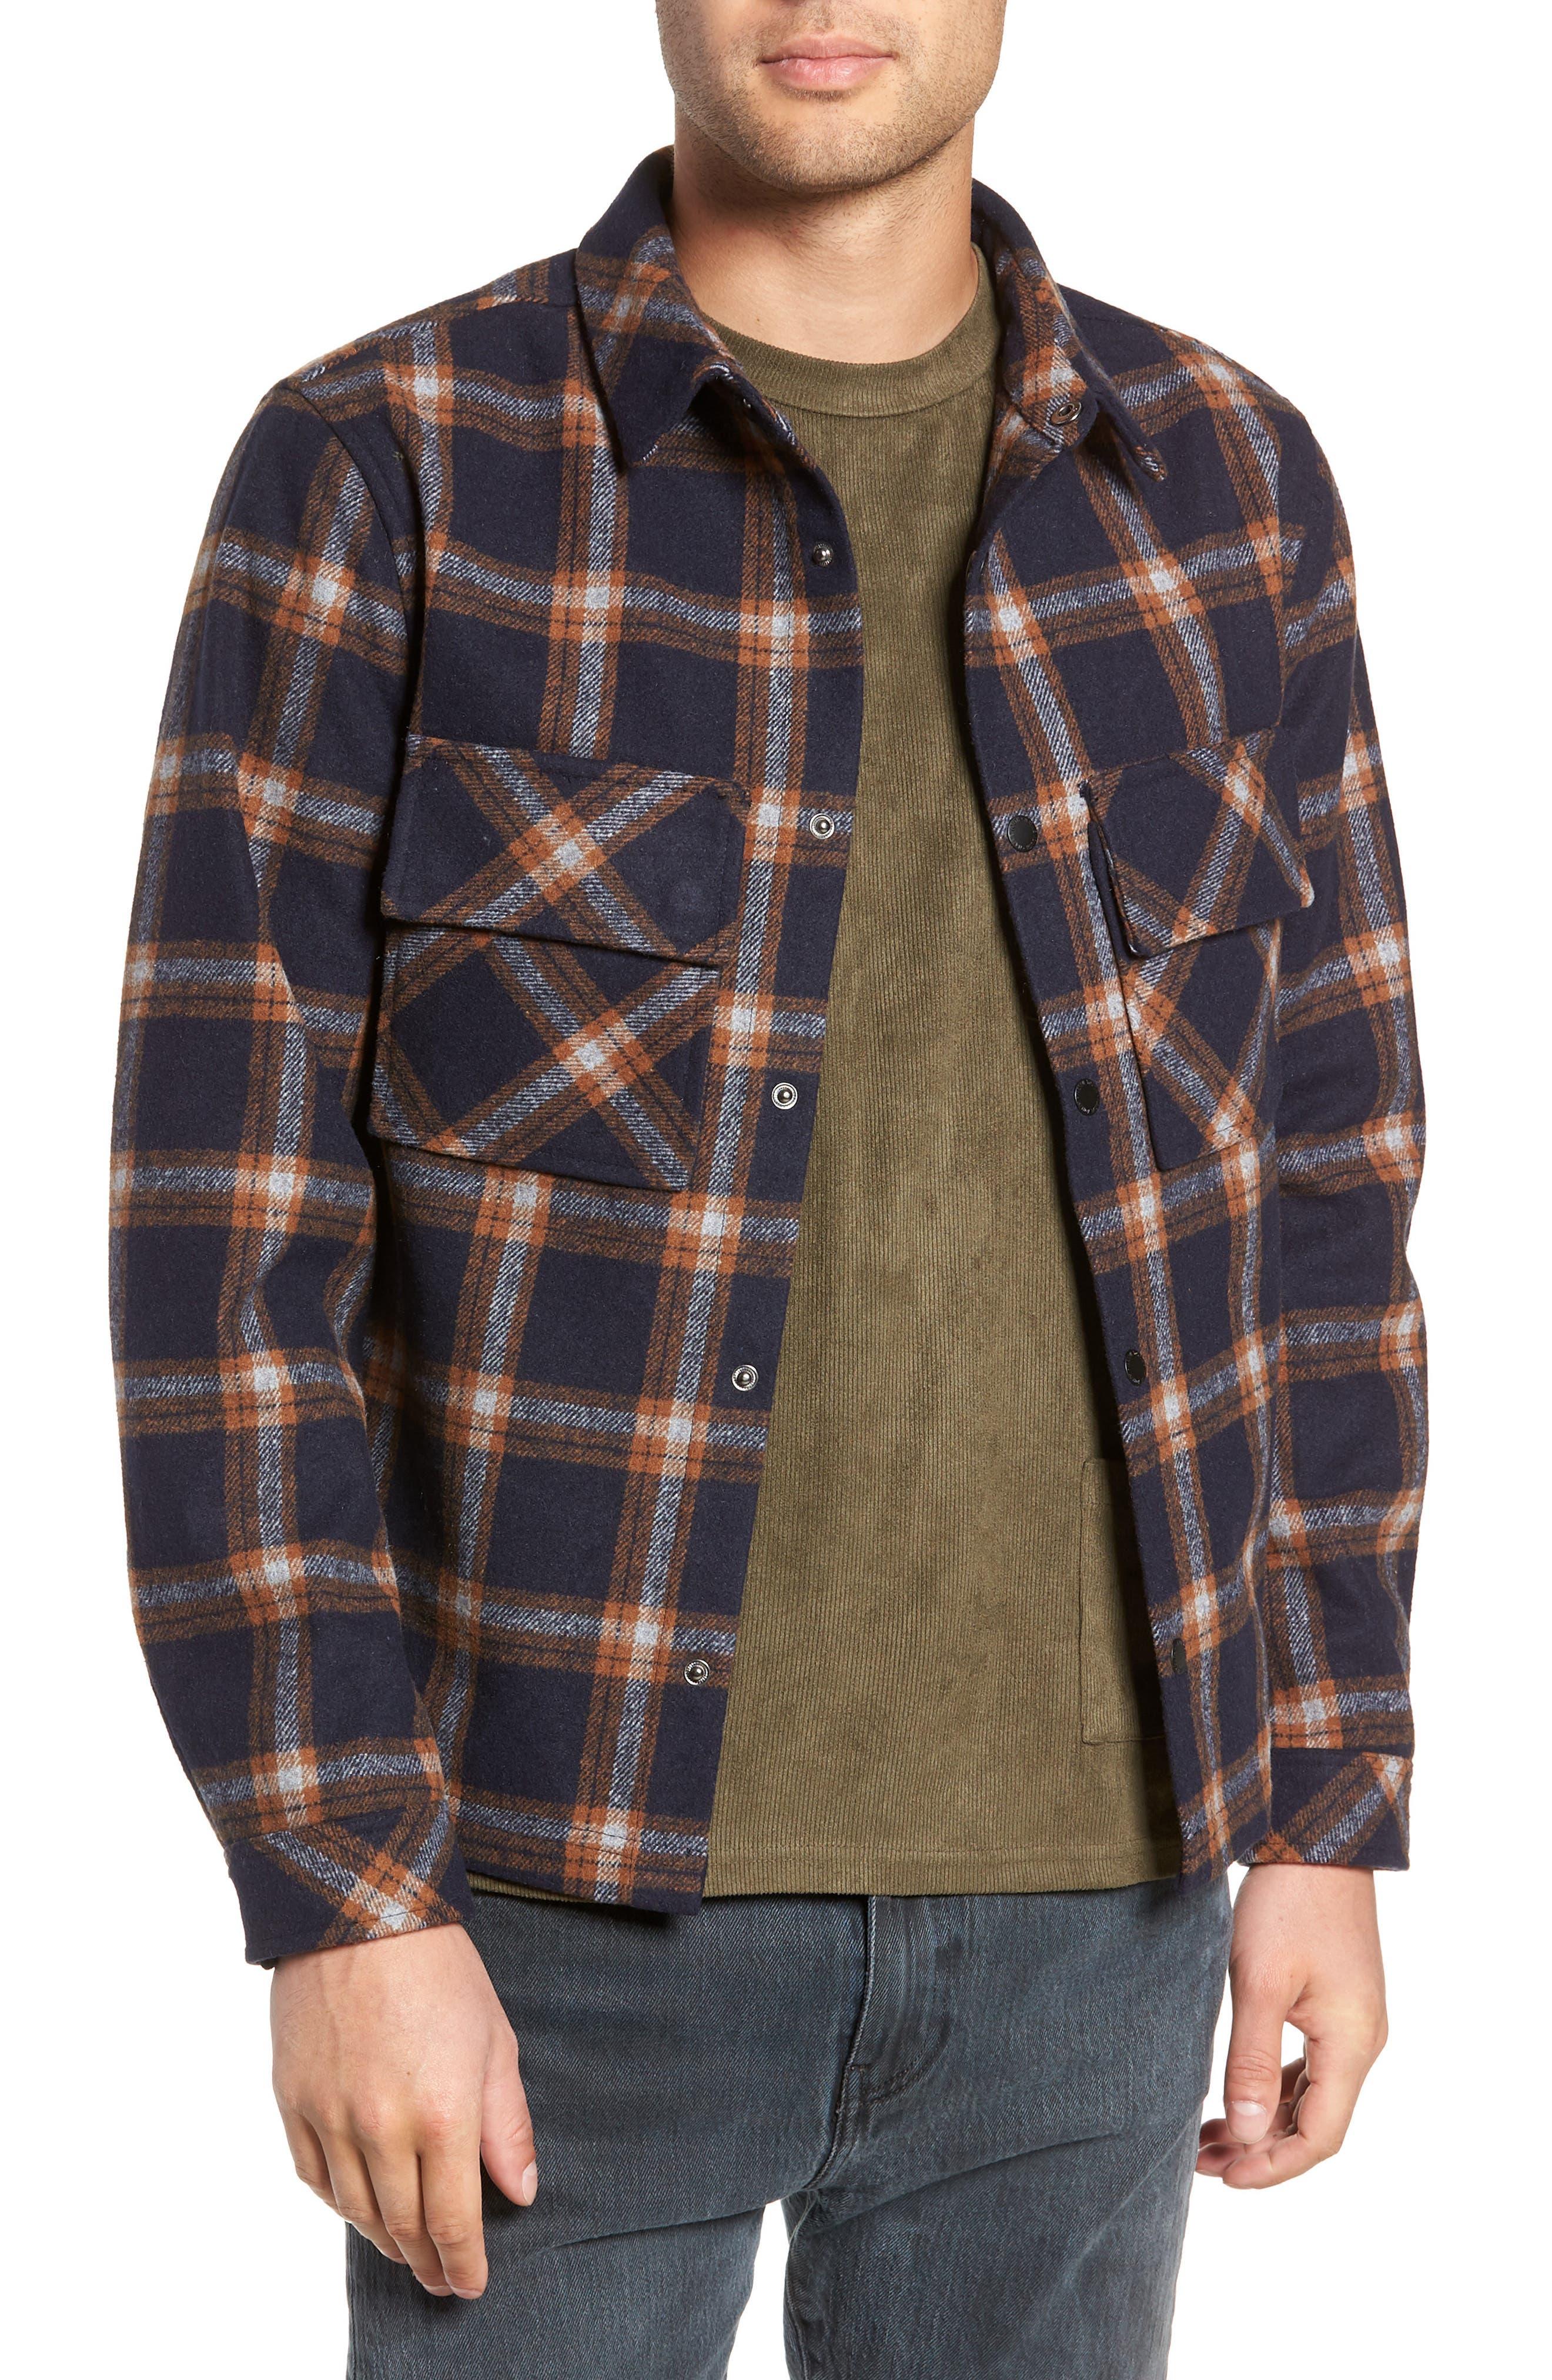 NATIVE YOUTH,                             Check Flannel Shirt,                             Main thumbnail 1, color,                             NAVY